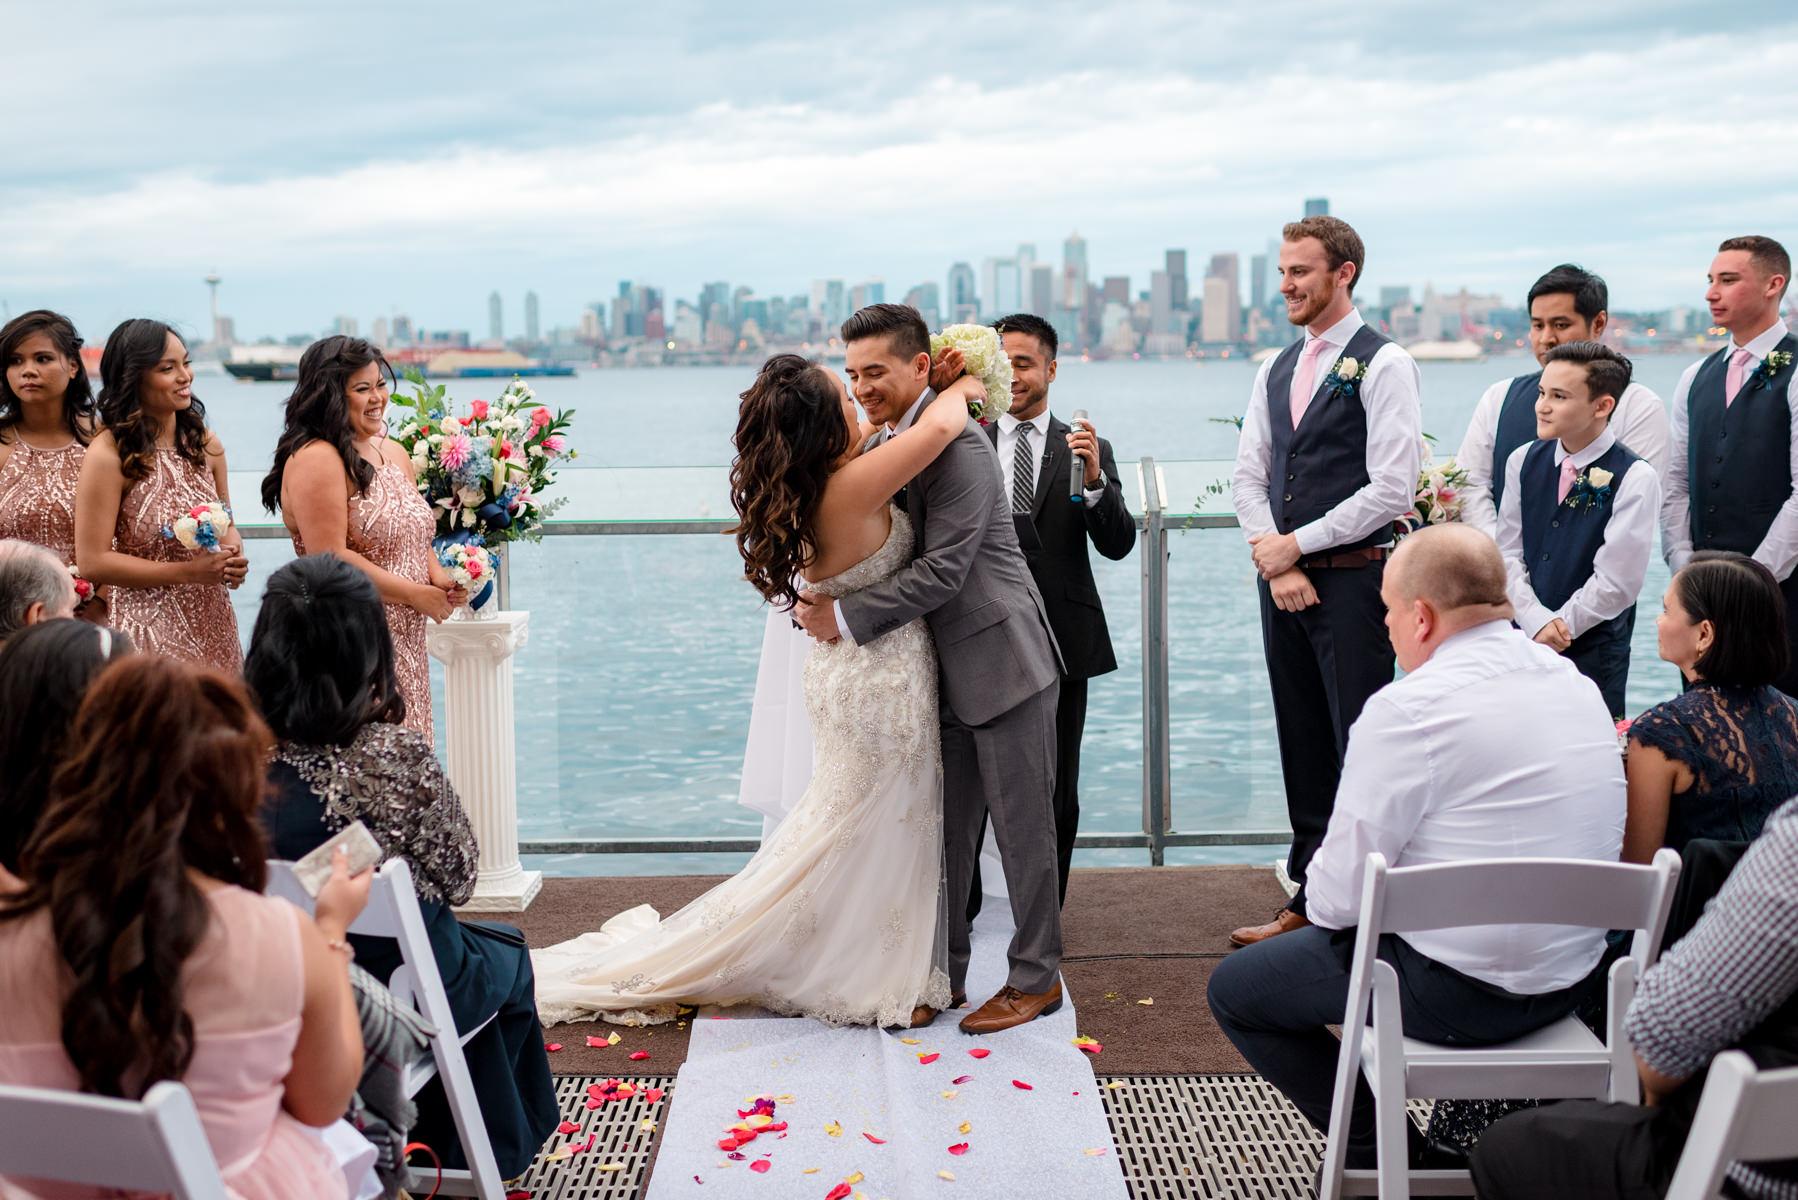 Andrew Tat - Documentary Wedding Photography - Salty's - Seattle, Washington -Mark & Marcy - 17.jpg